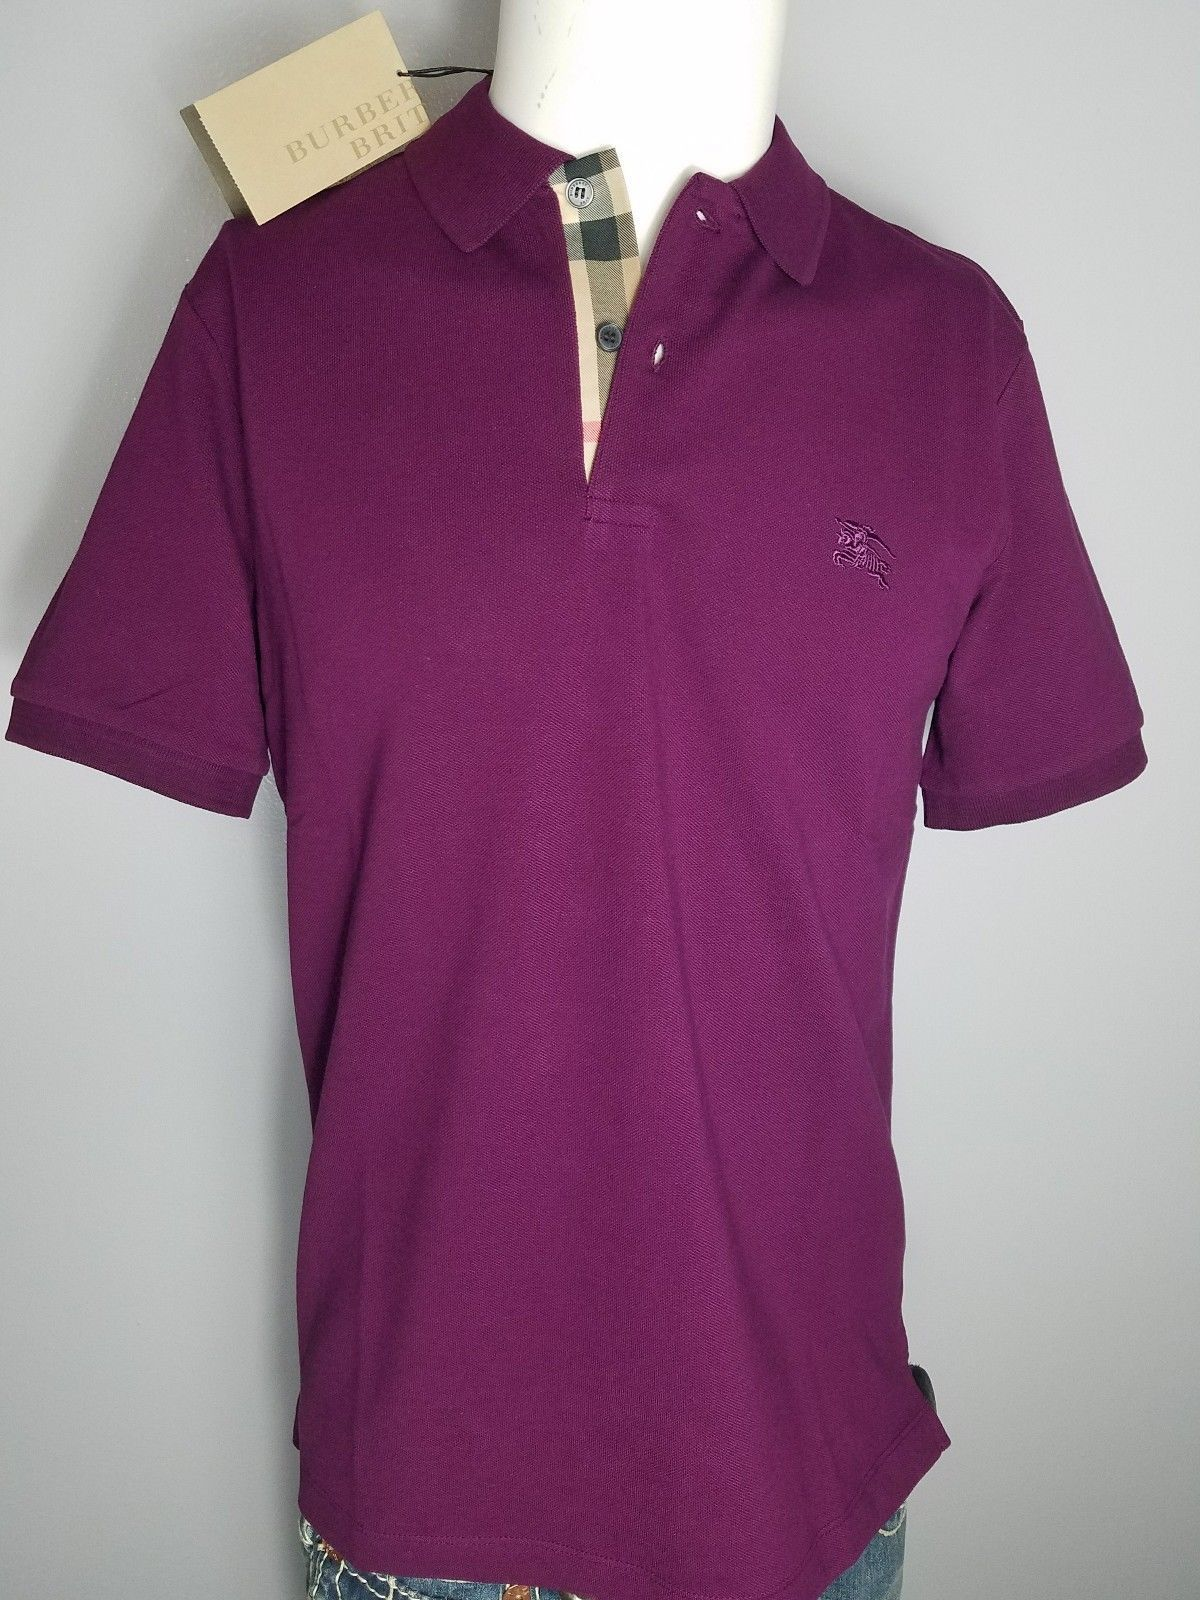 de9c3f8a Burberry Brit men purple amesthyst short sleeve nova check placket polo  shirt s,